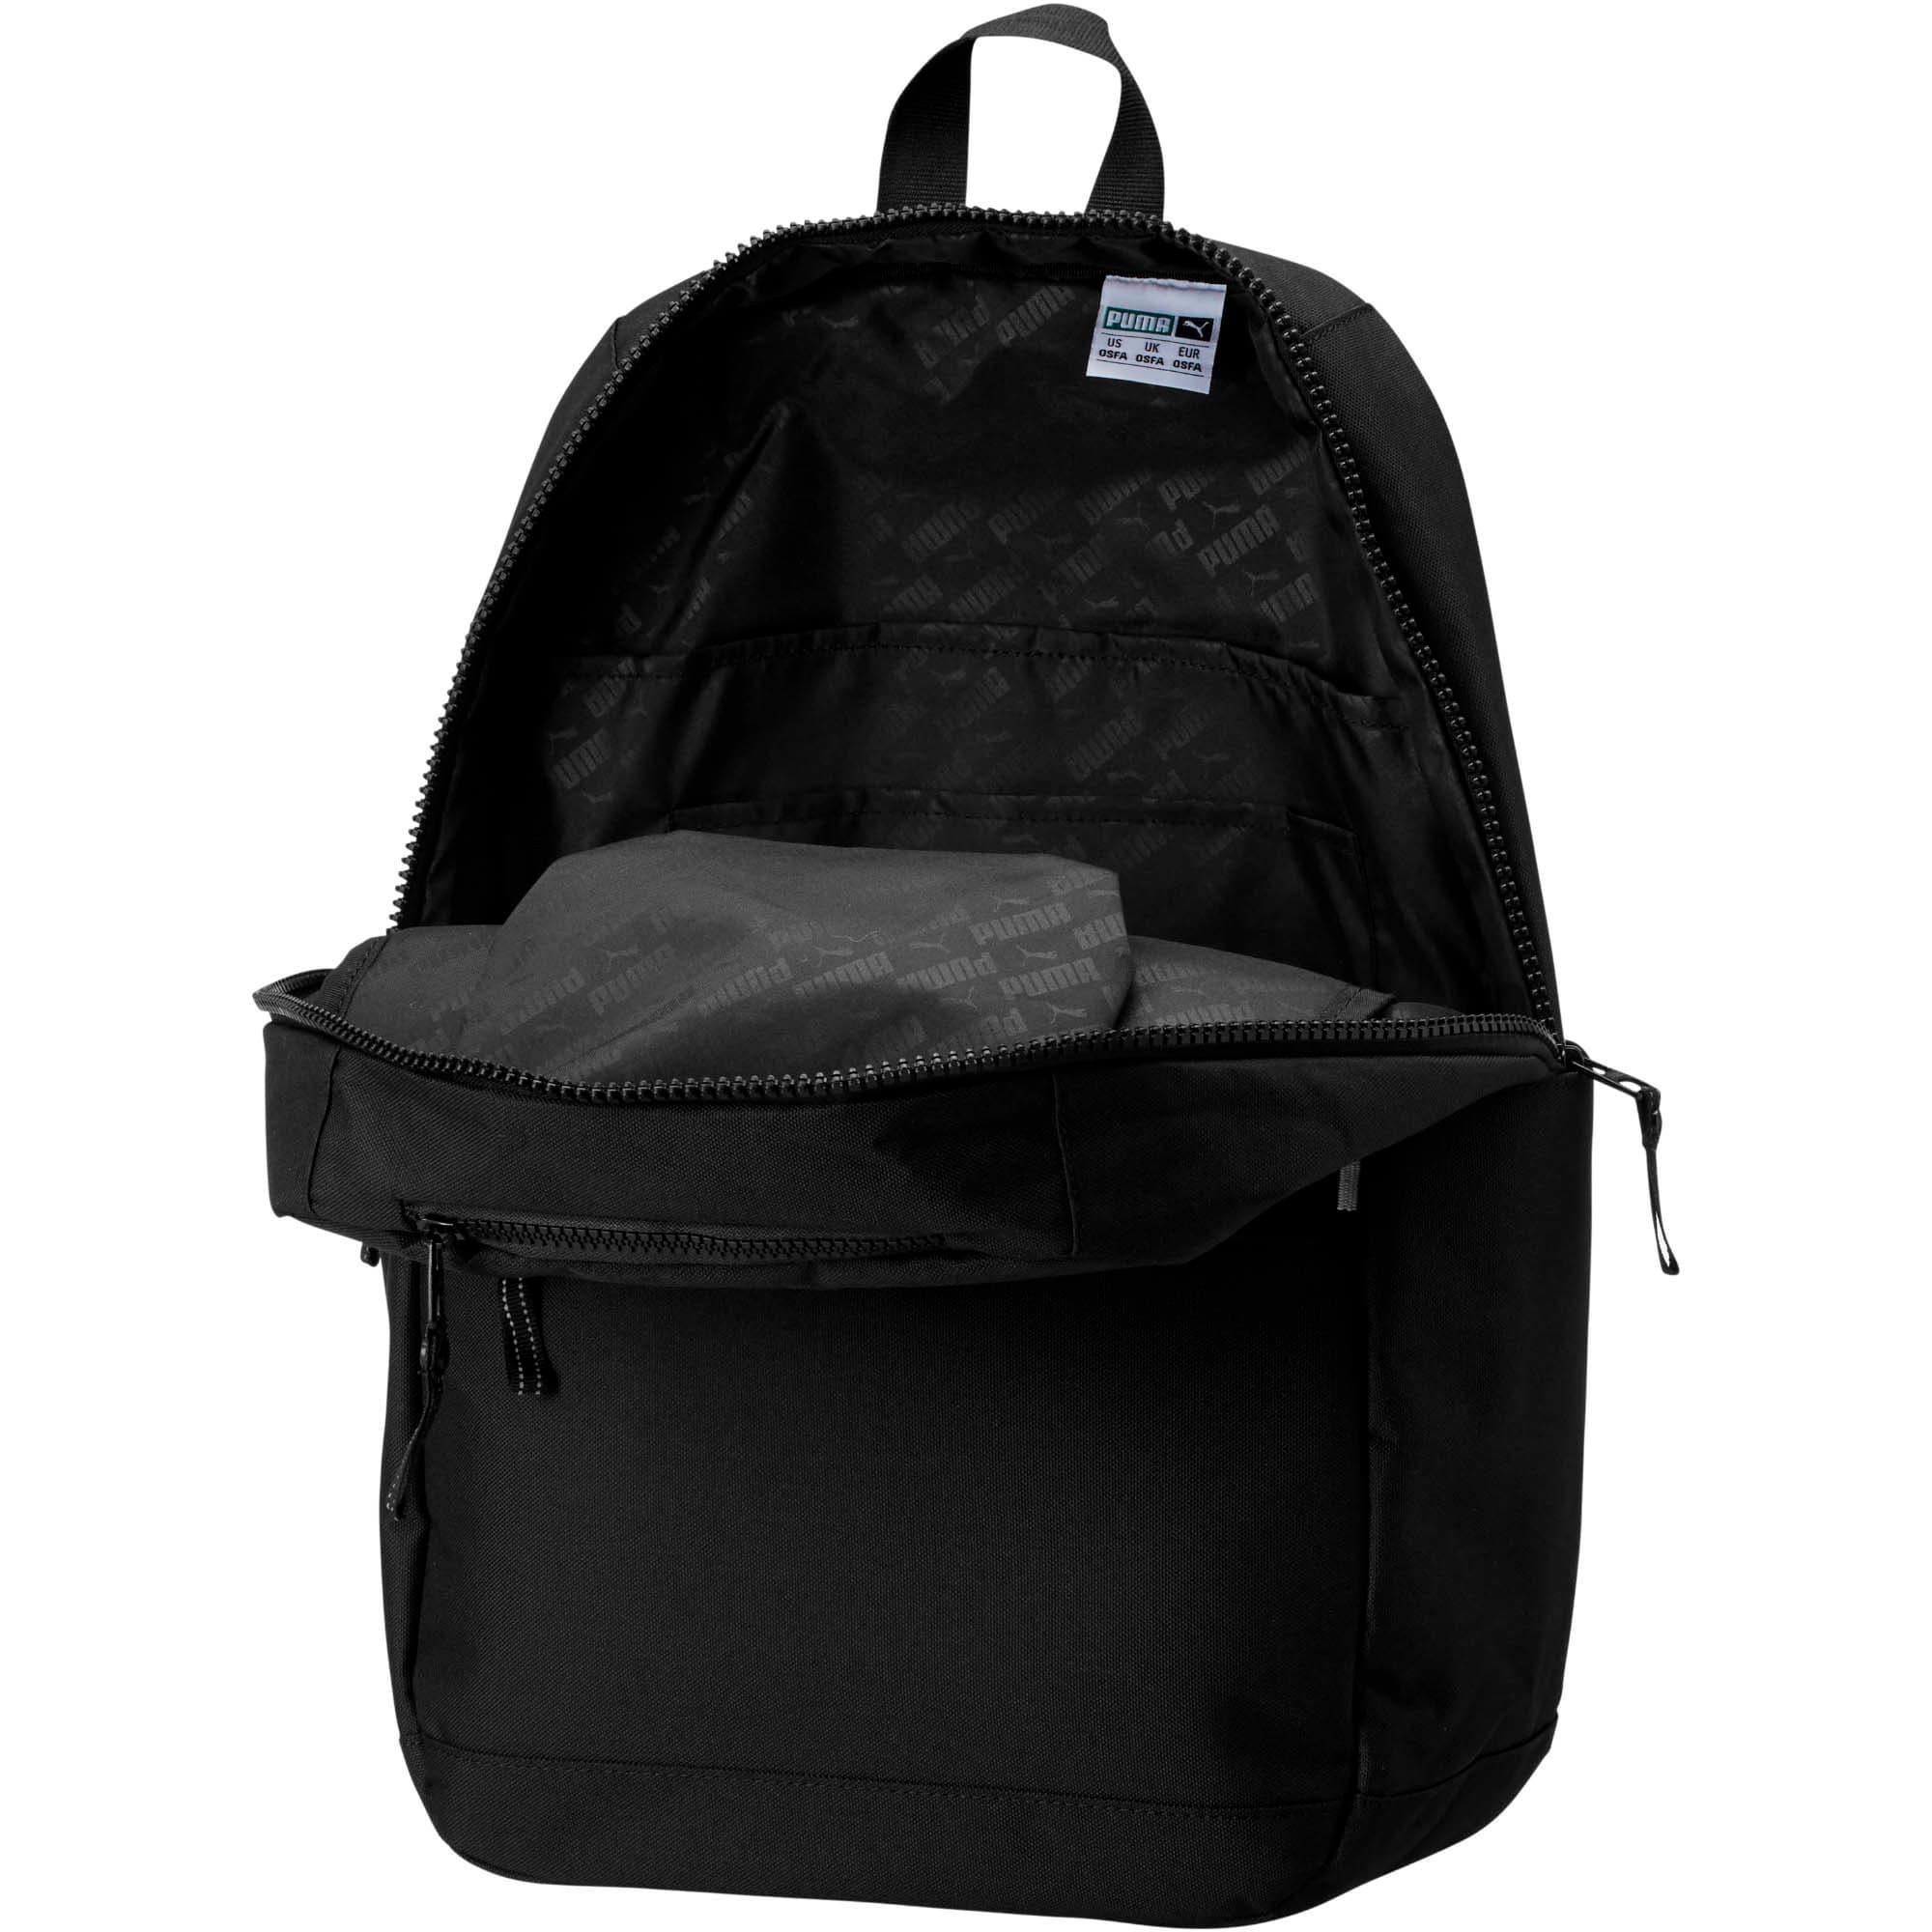 Thumbnail 2 of Streak Backpack, Black, medium